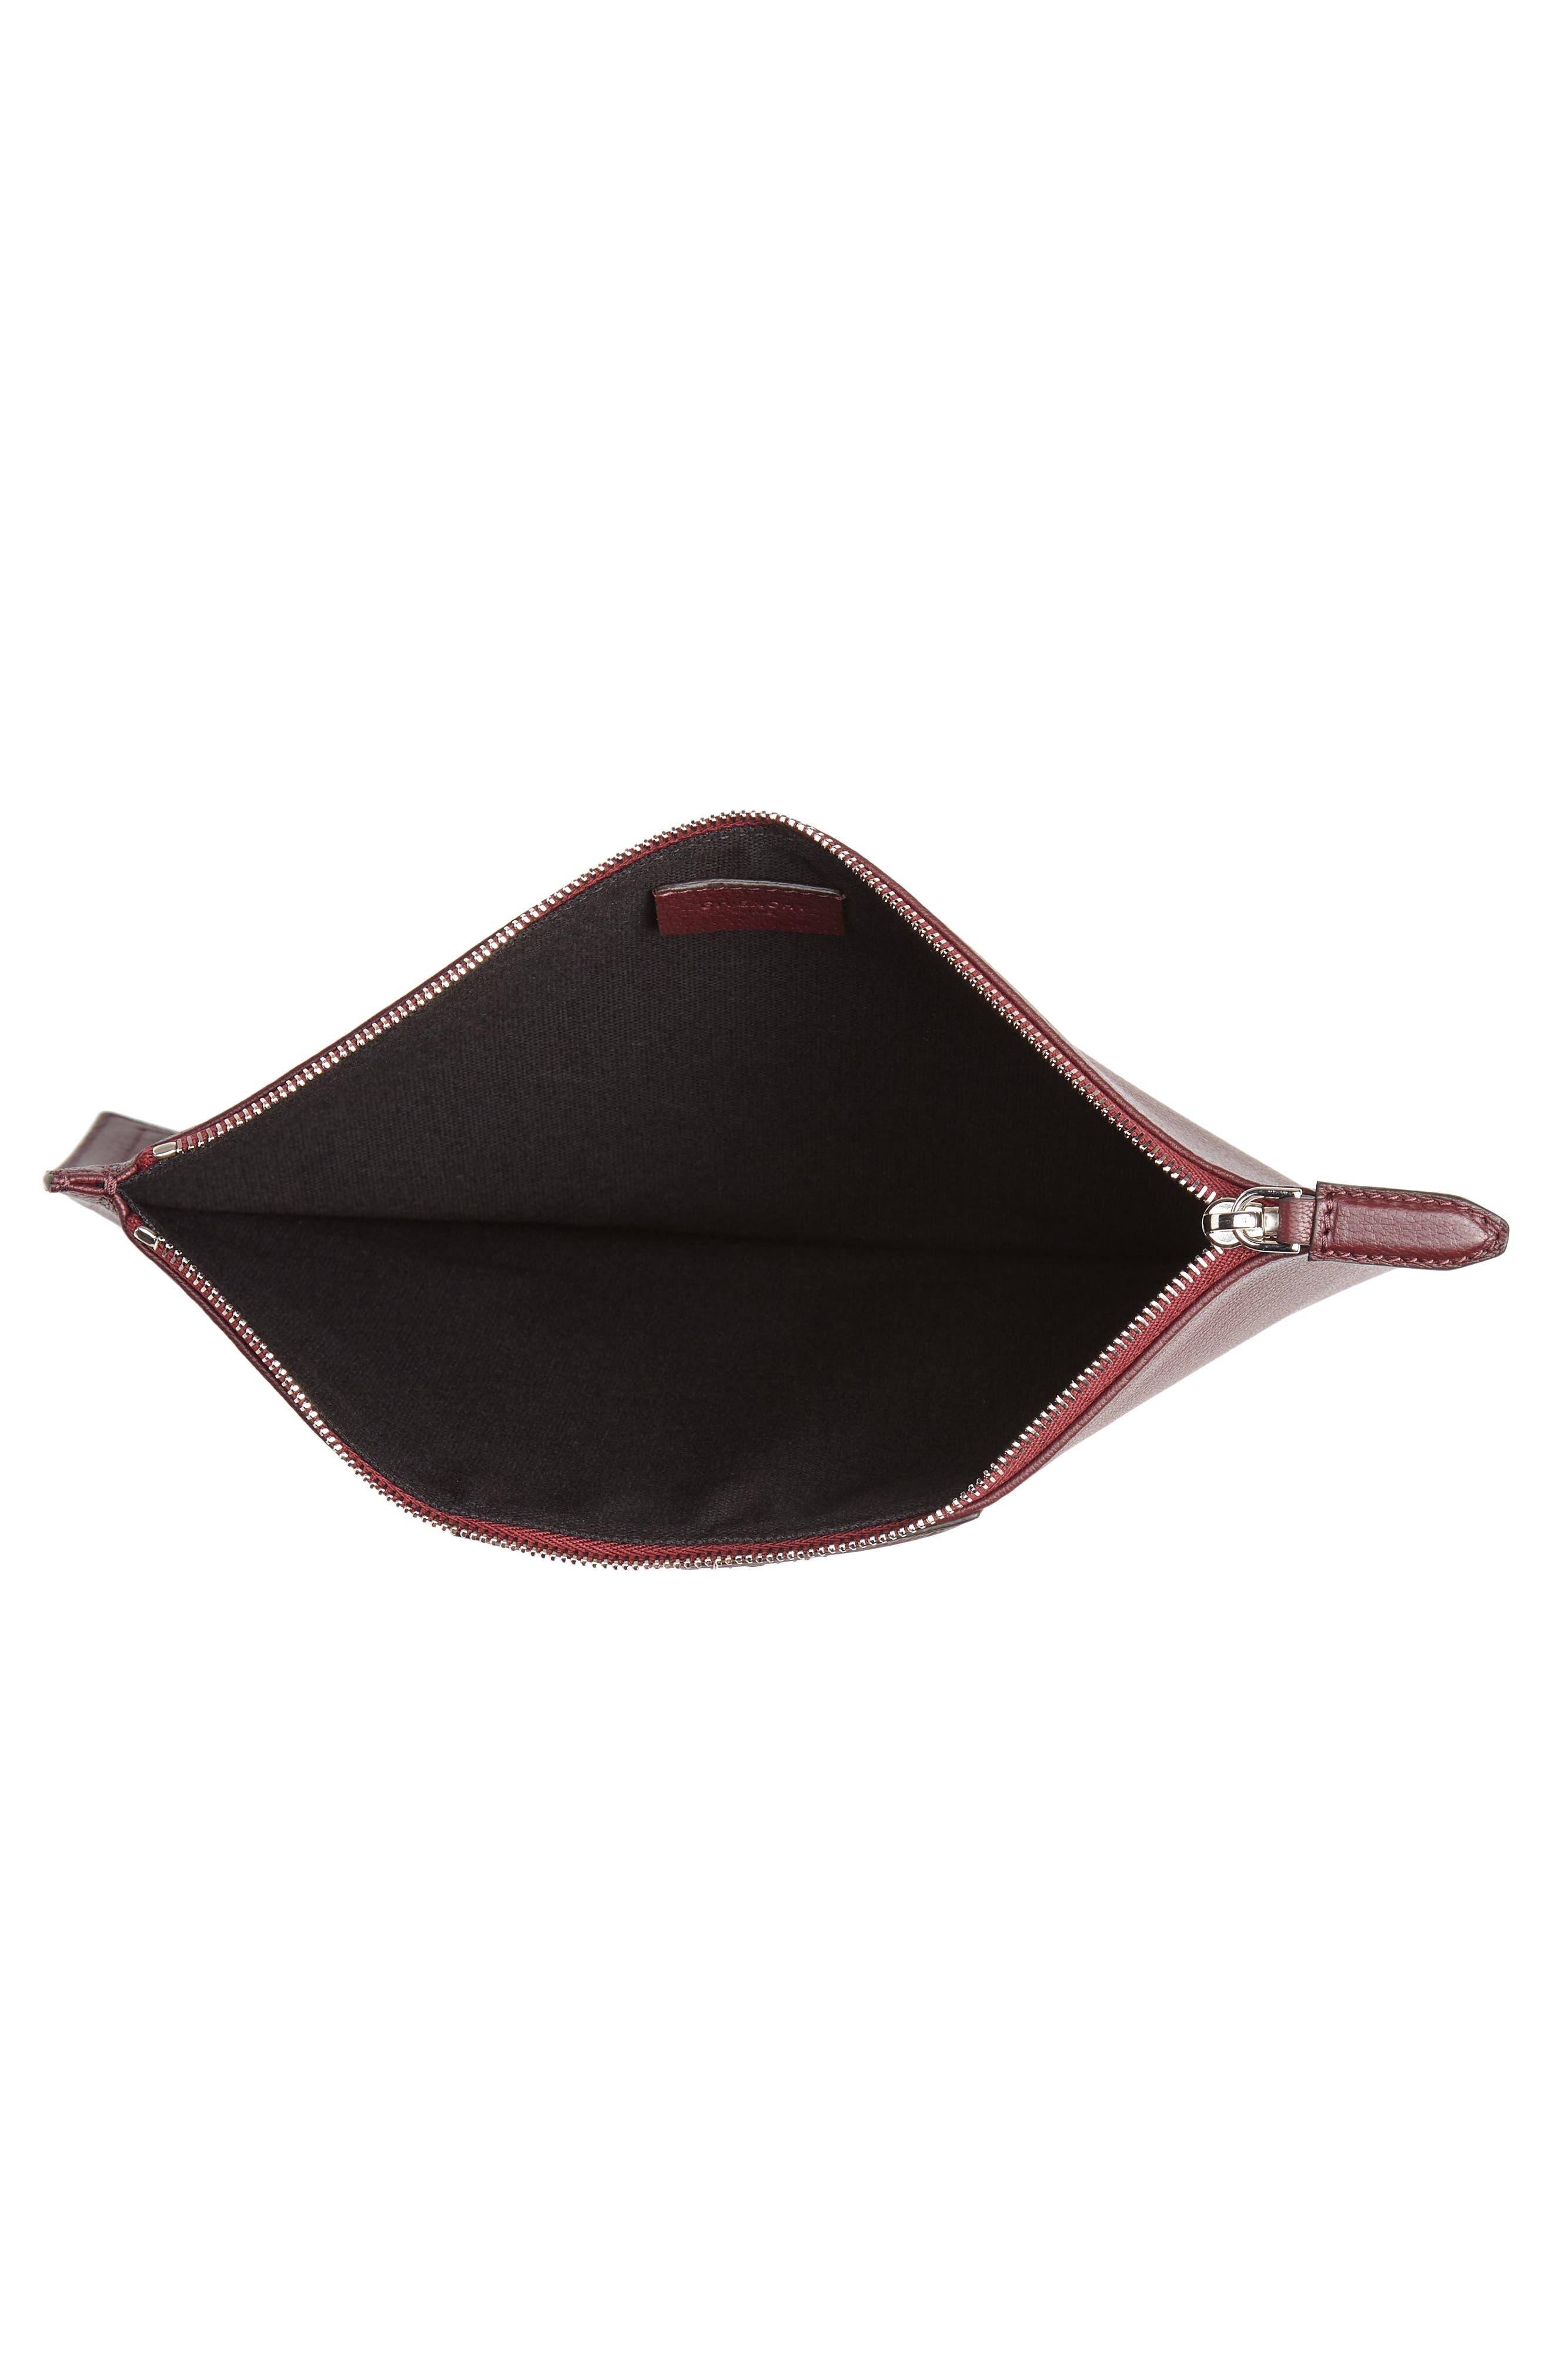 Medium Antigona Leather Pouch,                             Alternate thumbnail 4, color,                             AUBERGINE